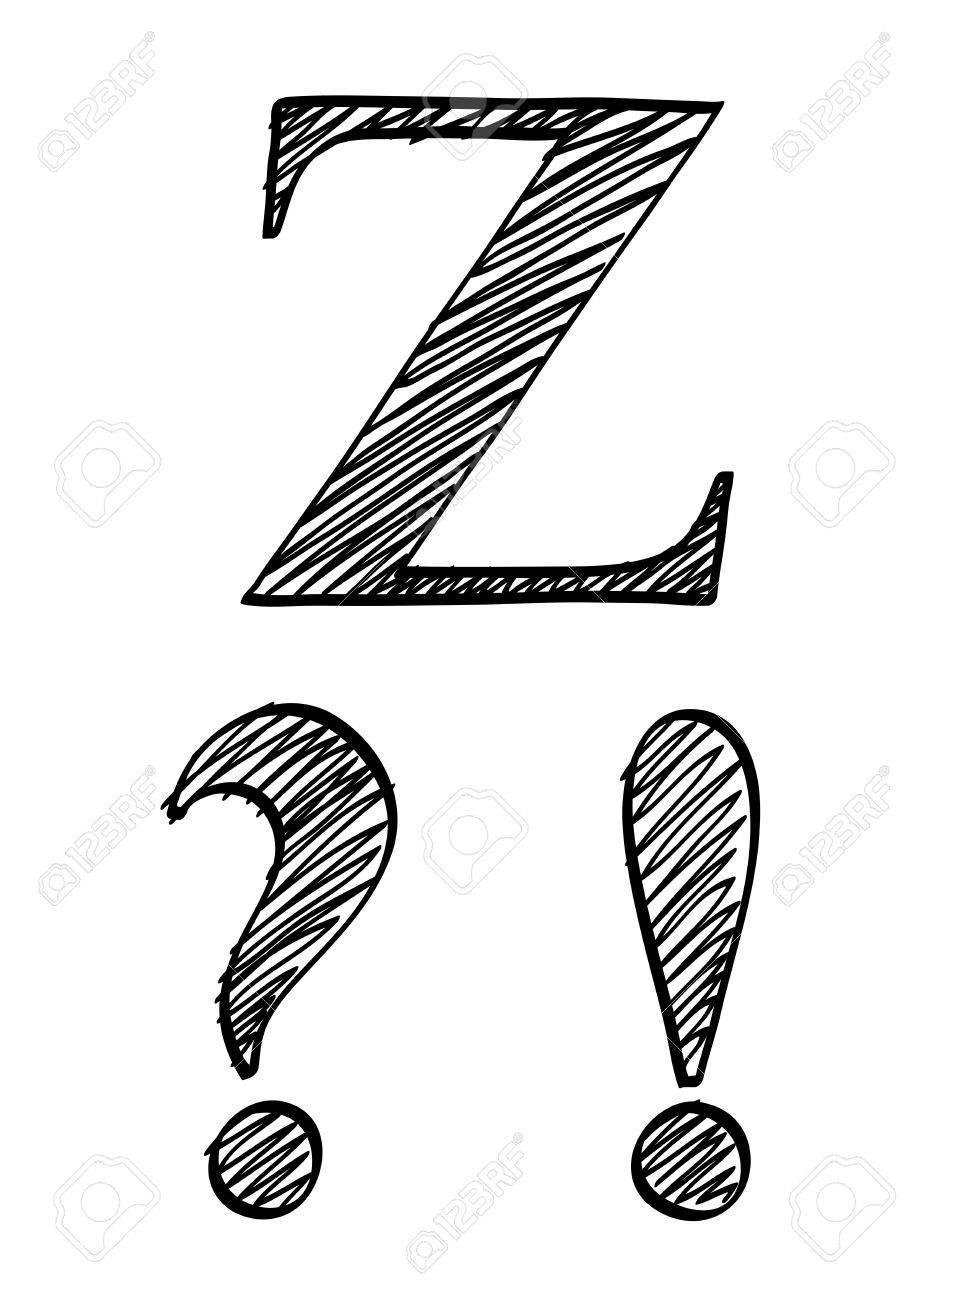 Doodle scribble sketch alphabet interrogation exclamation point doodle scribble sketch alphabet interrogation exclamation point letter z with solid outline and pen fill spiritdancerdesigns Image collections